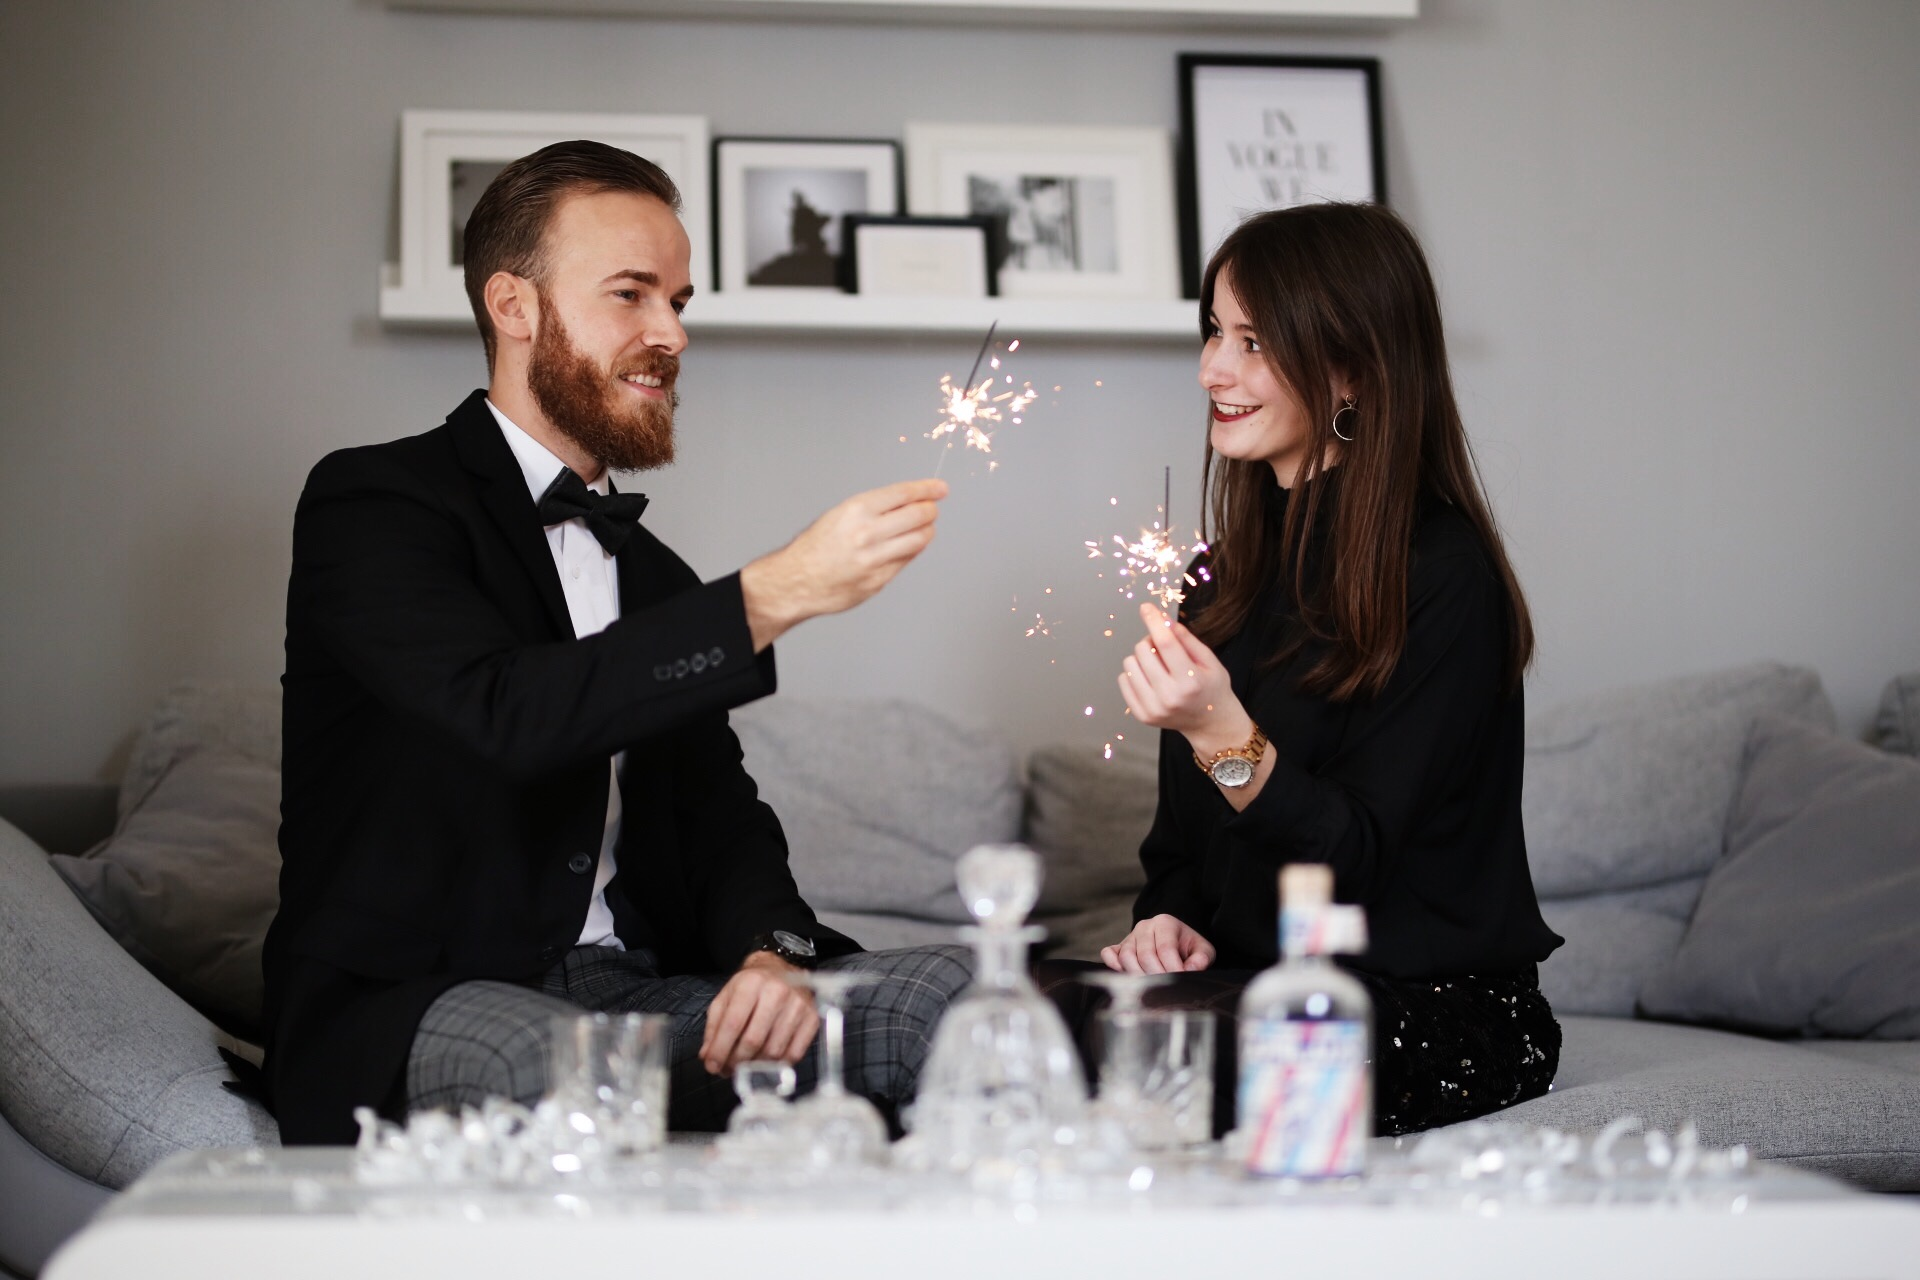 LIFESTYLE – Happy New Year